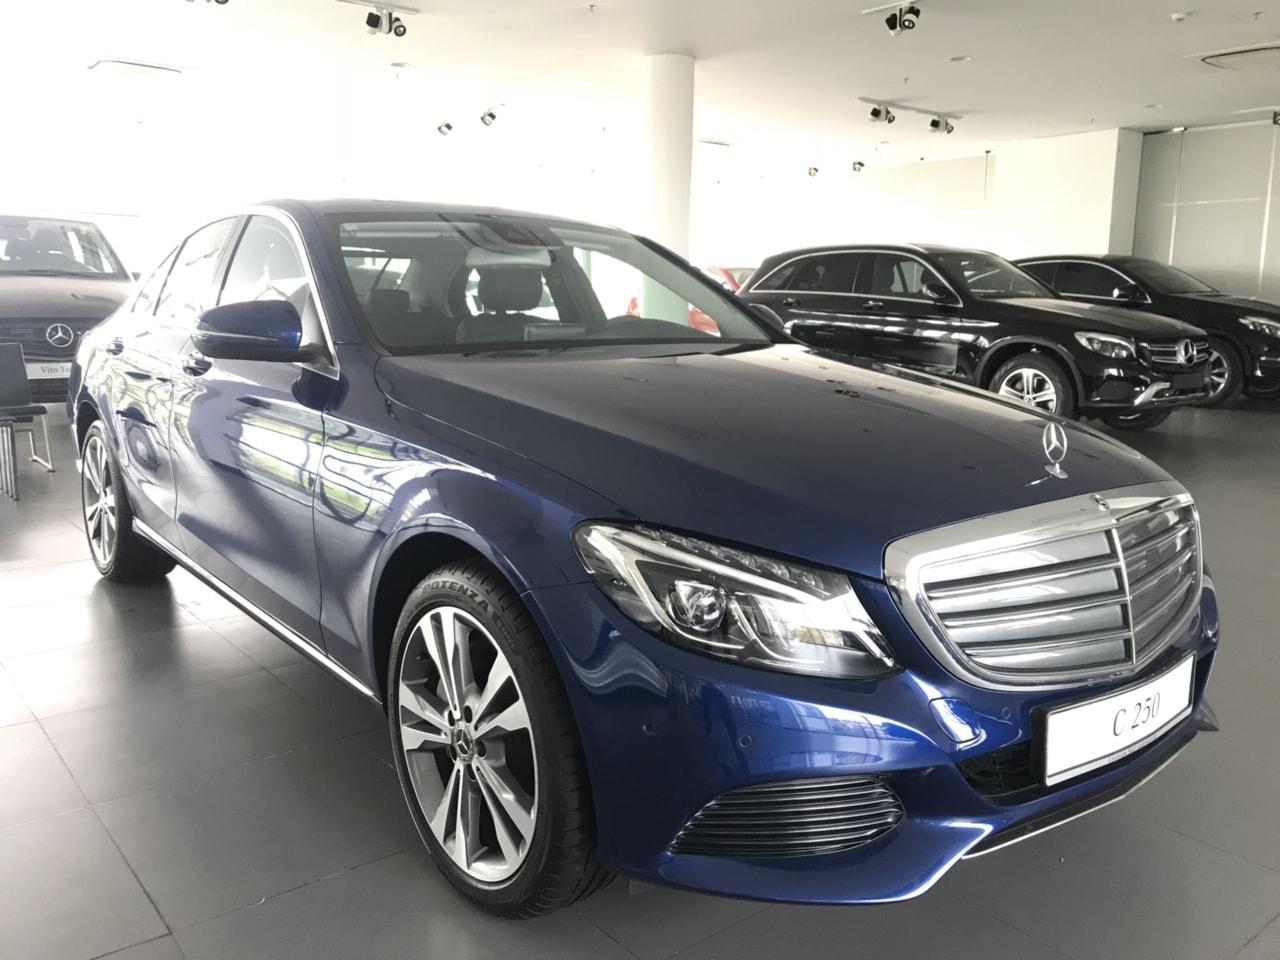 Mercedes C250 2018 2019 moi nhat (1)